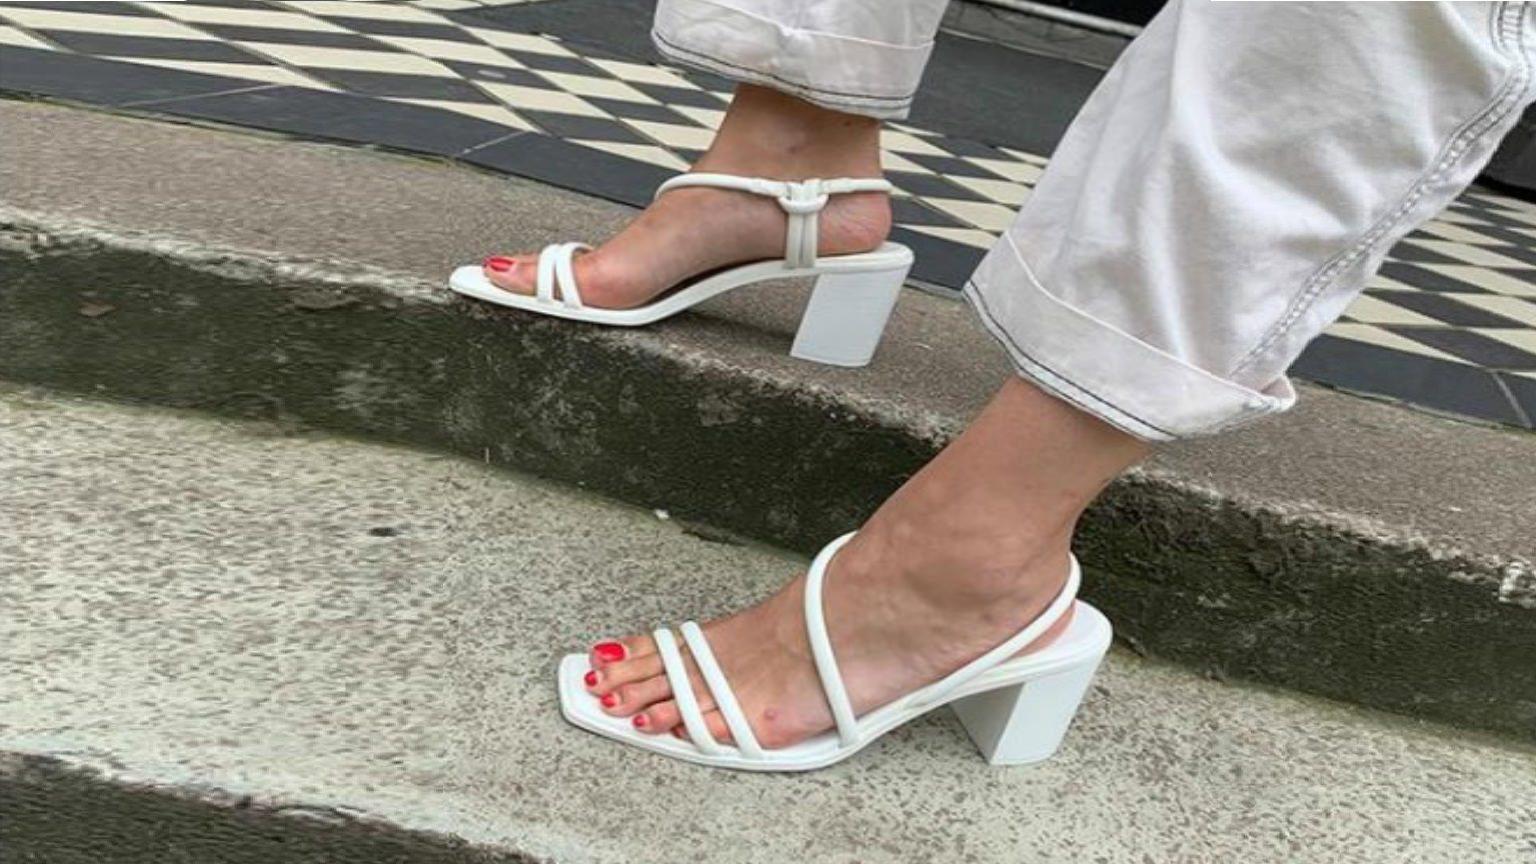 Summer sandals on woman's feet